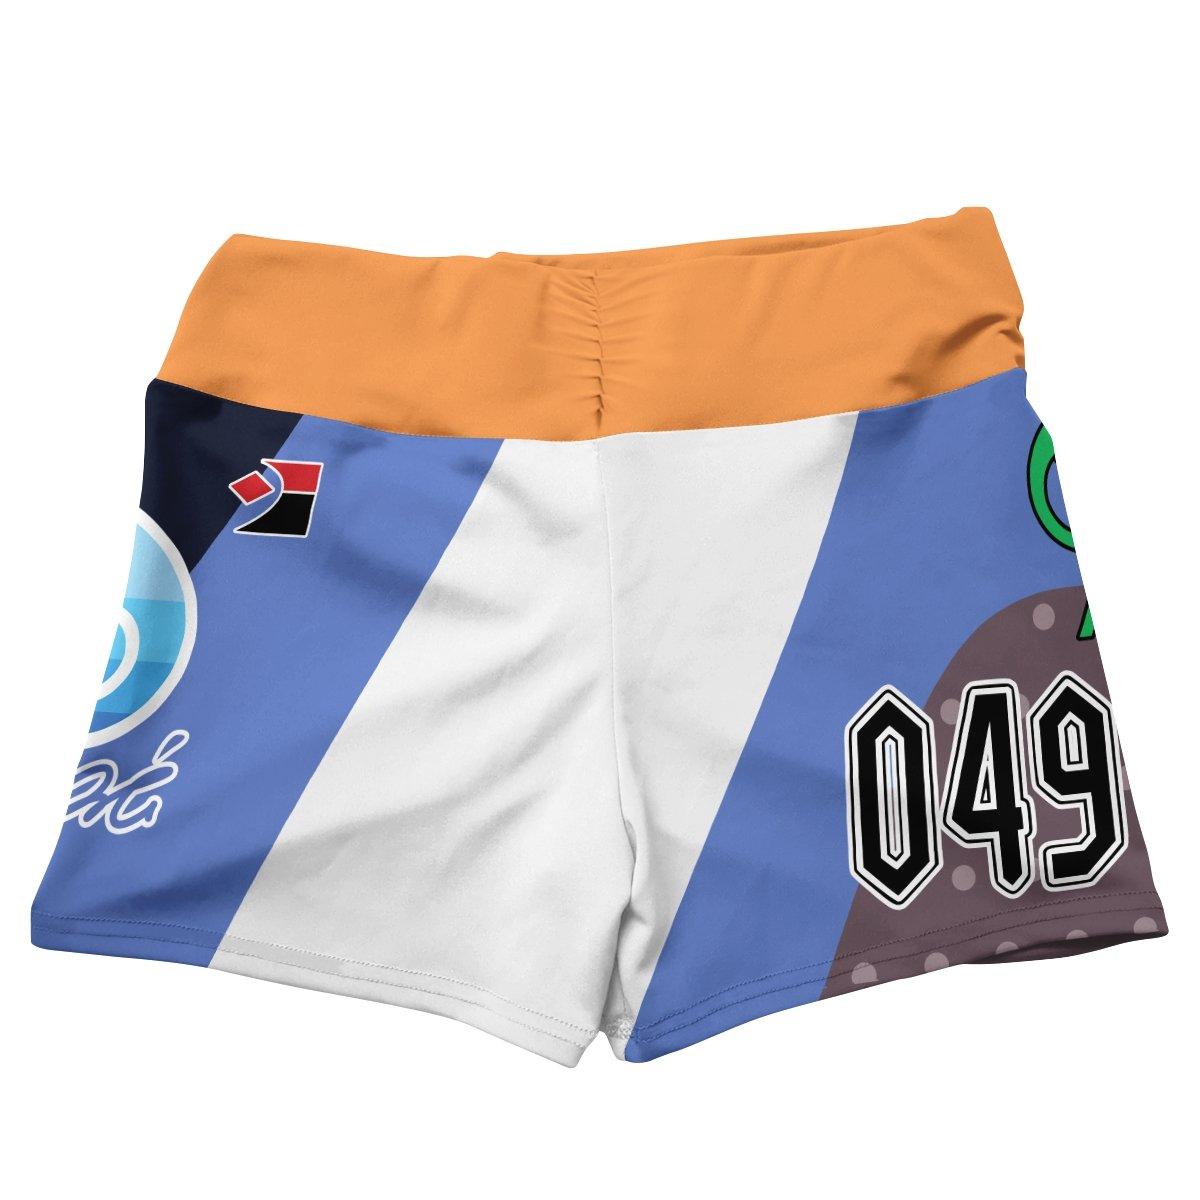 pokemon water uniform active wear set 143133 - Anime Swimsuits